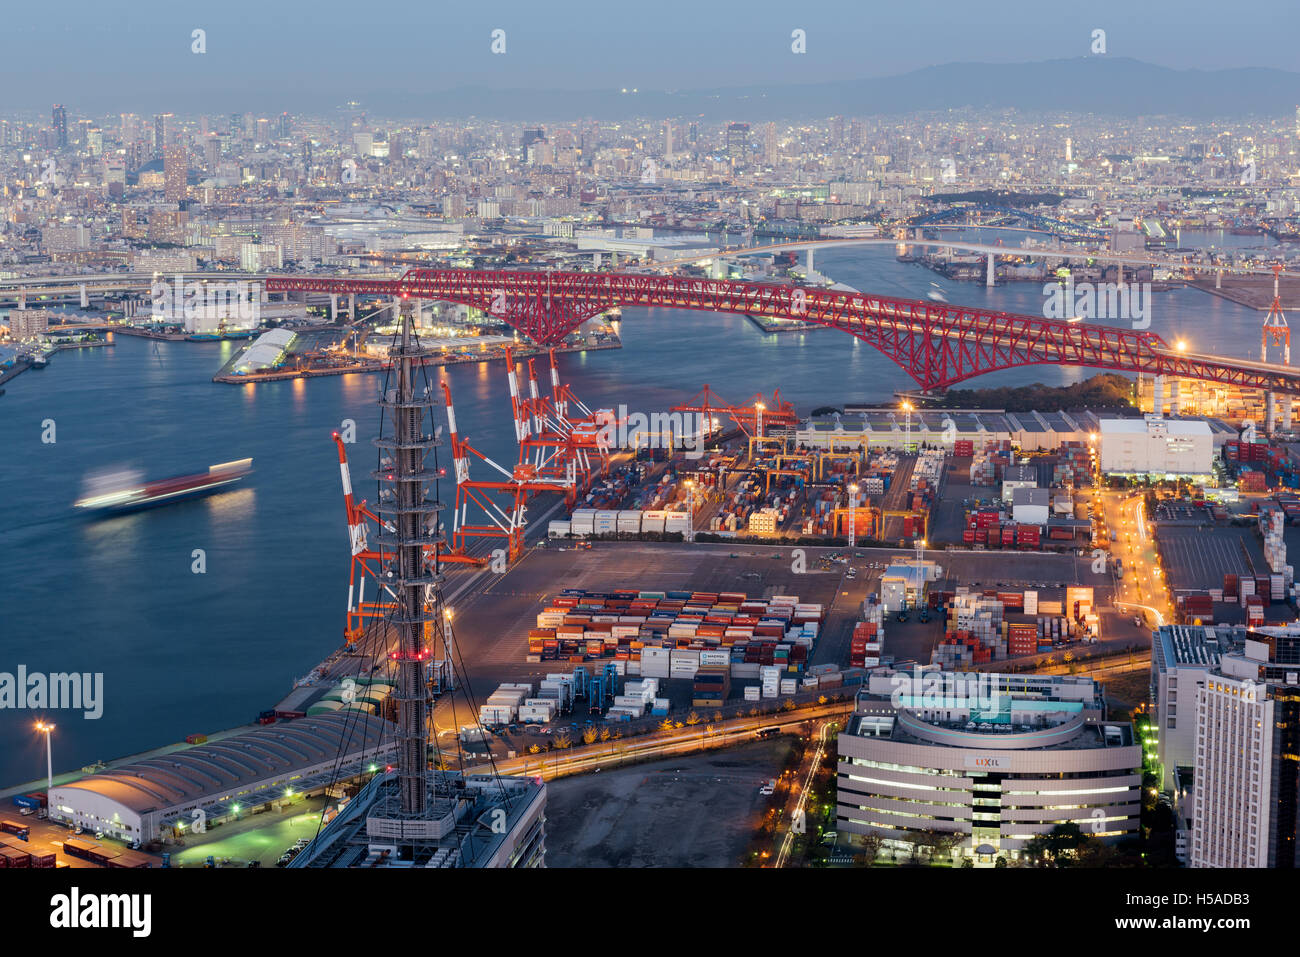 Osaka, Japan – November 30 2015: View from atop the World Trade Center of Osaka Sea Port built on reclaimed land Stock Photo